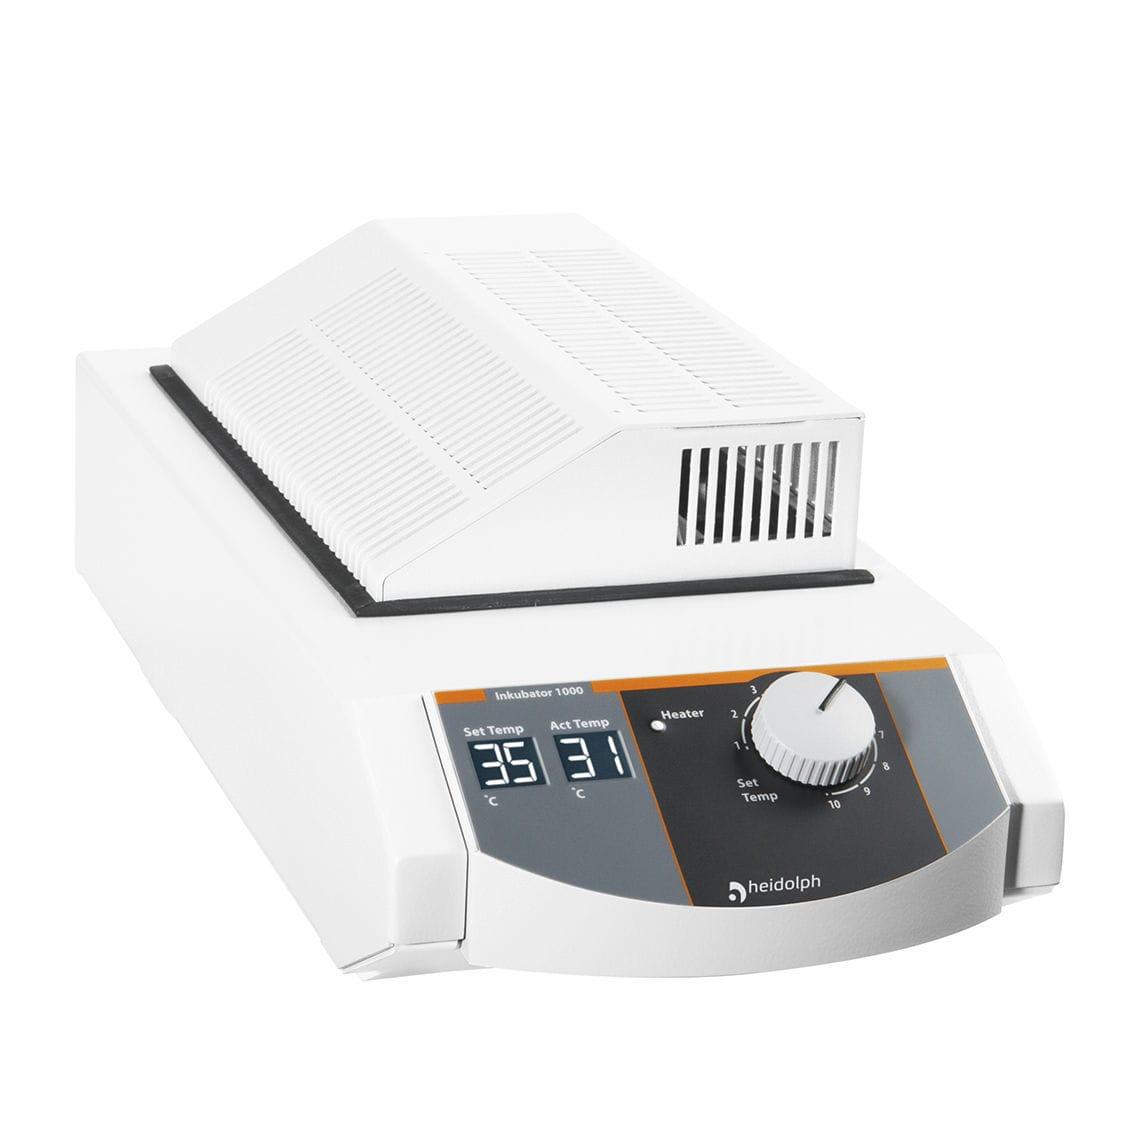 Incubator 1000 Heating Module, Heidolph